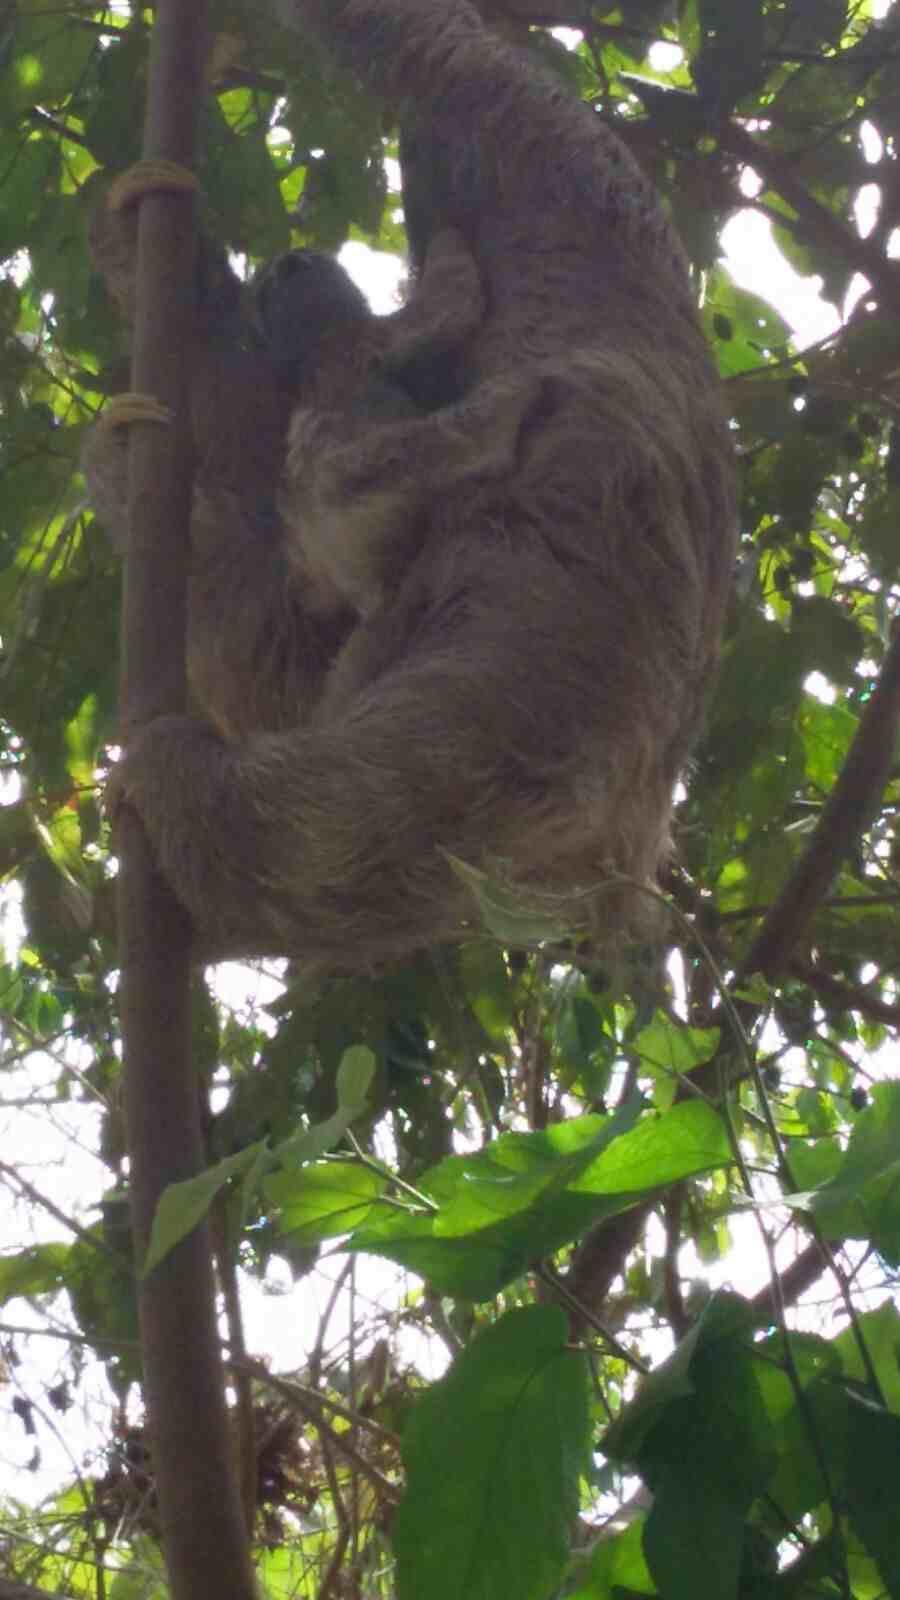 Baby sloth1